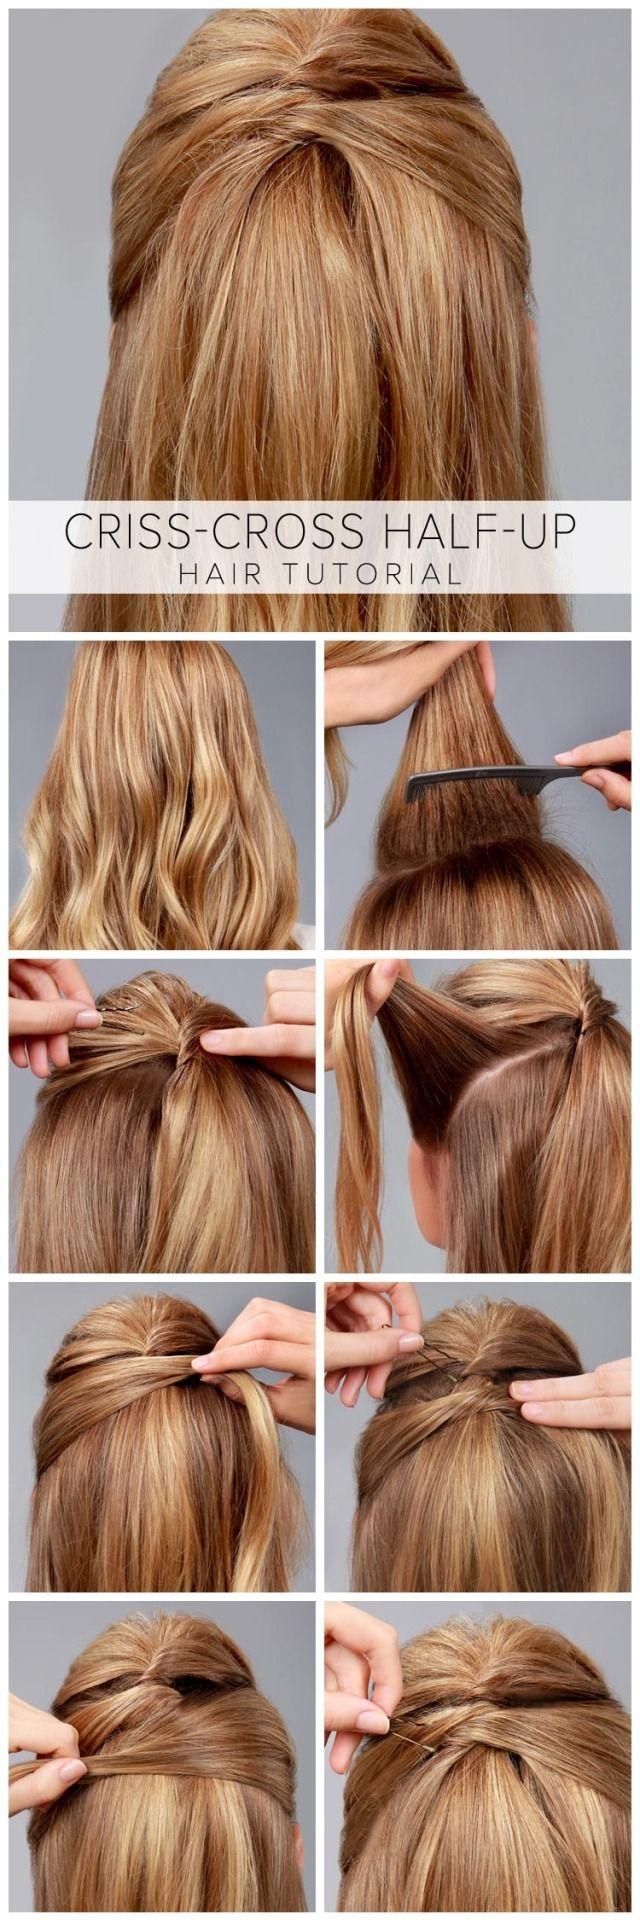 Diy half up hair tutorial hair styles pinterest hair style